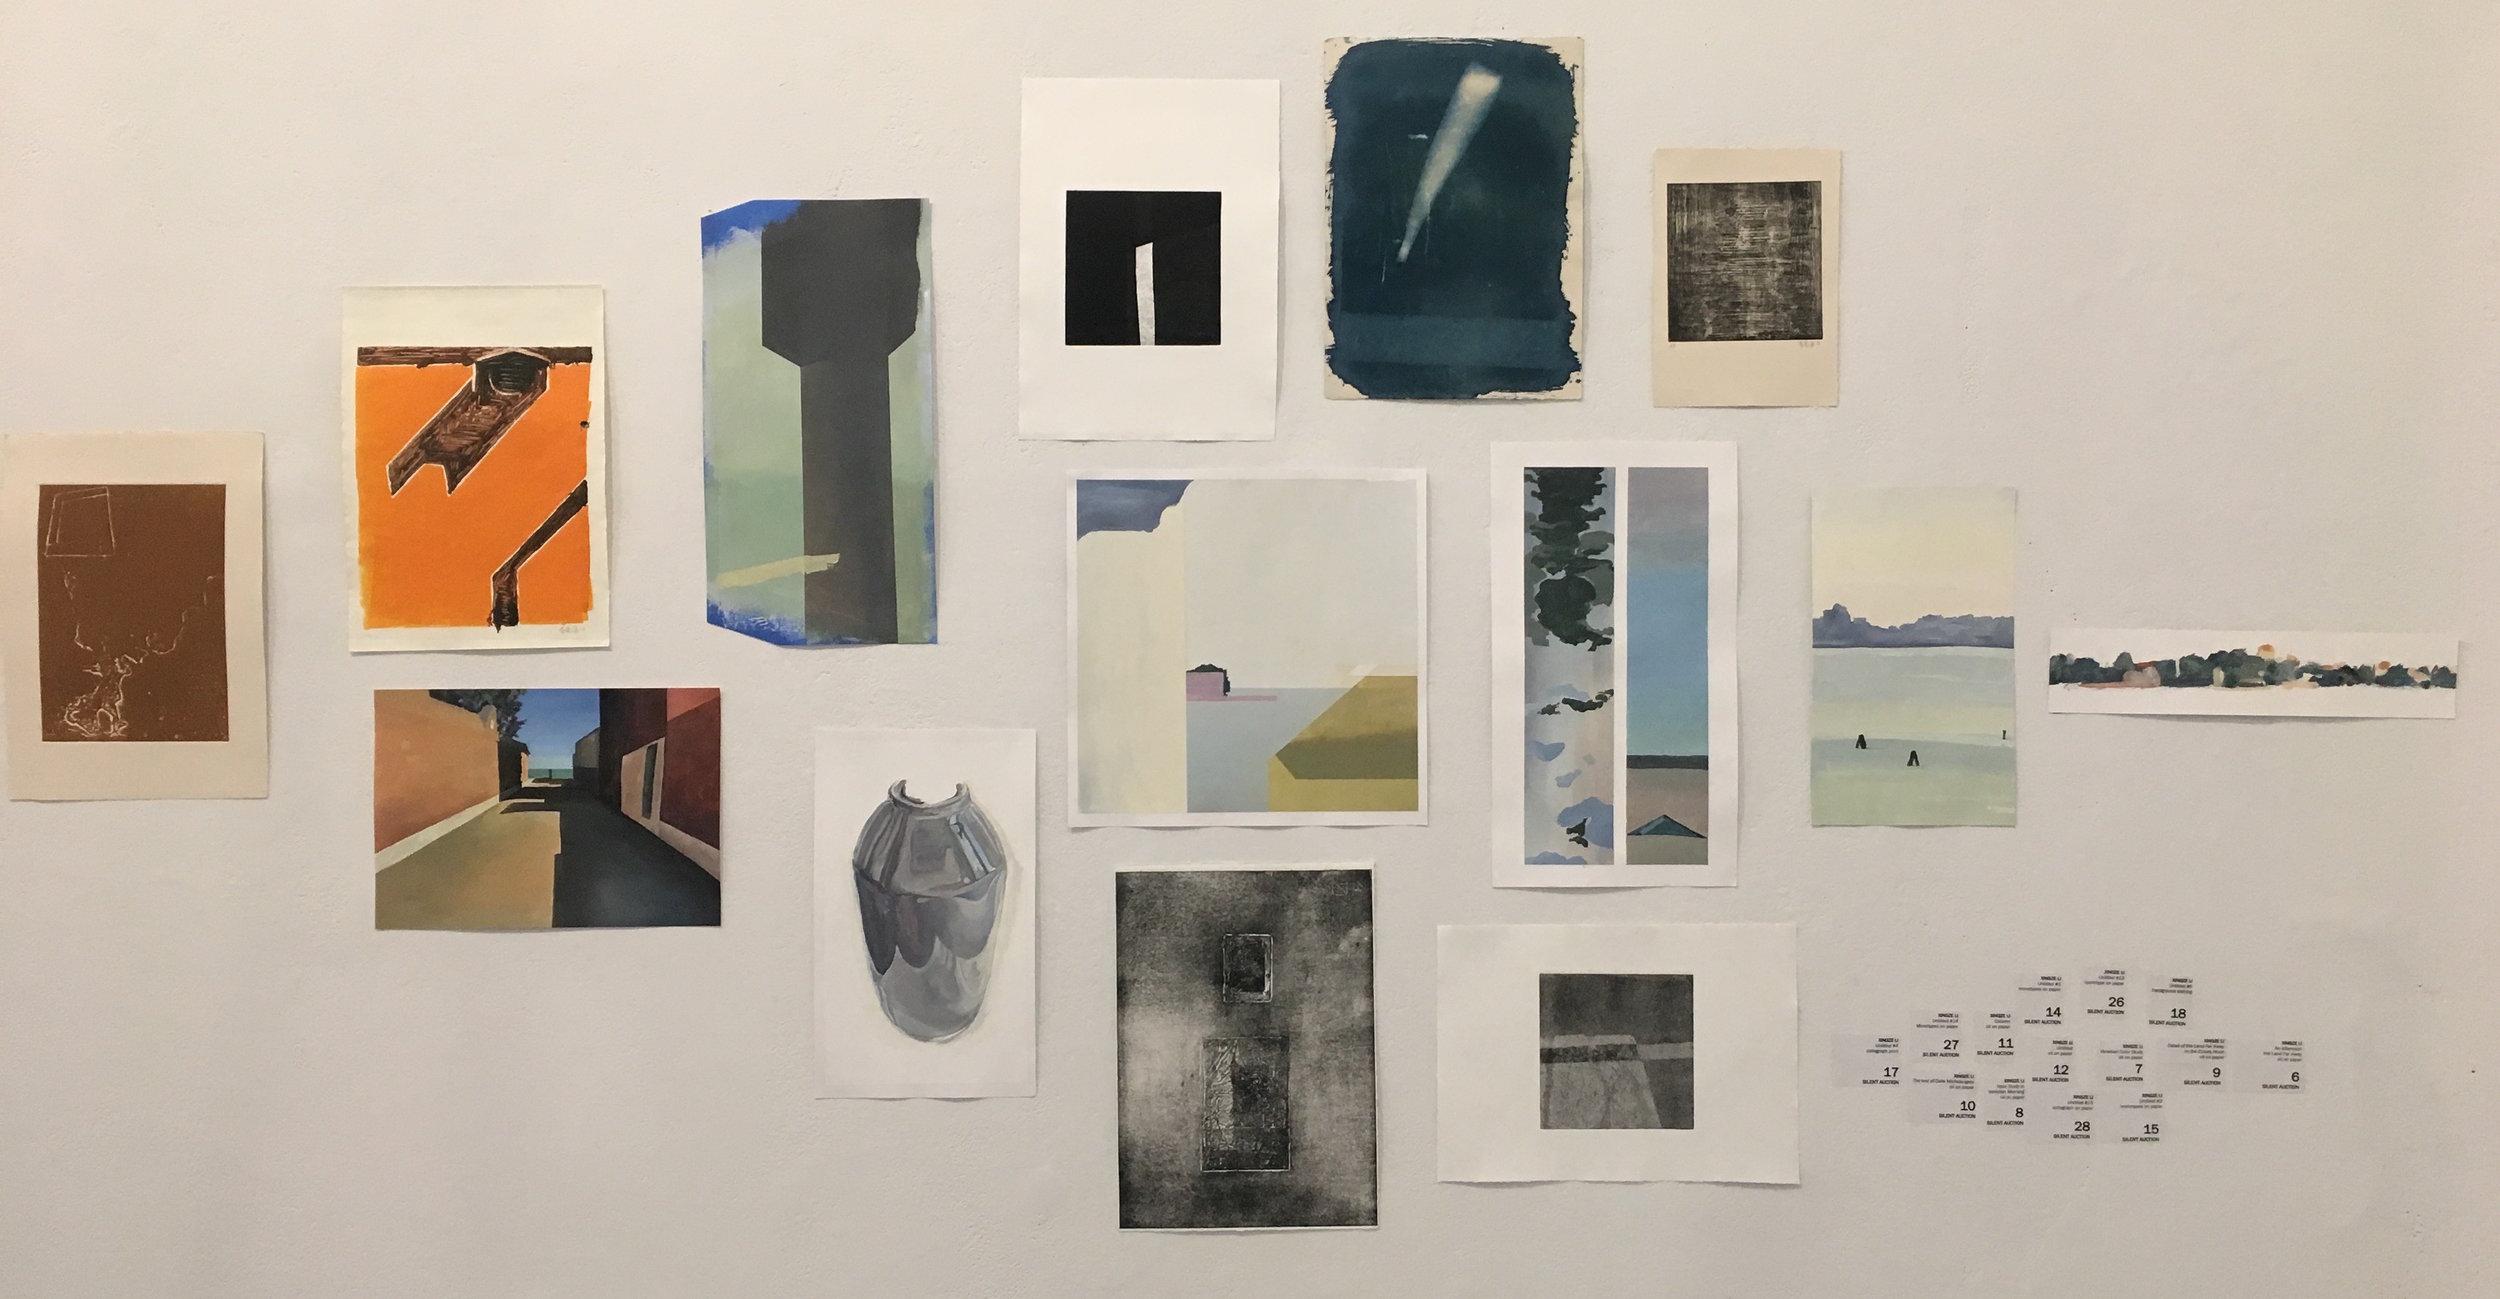 Works by Xingze Li